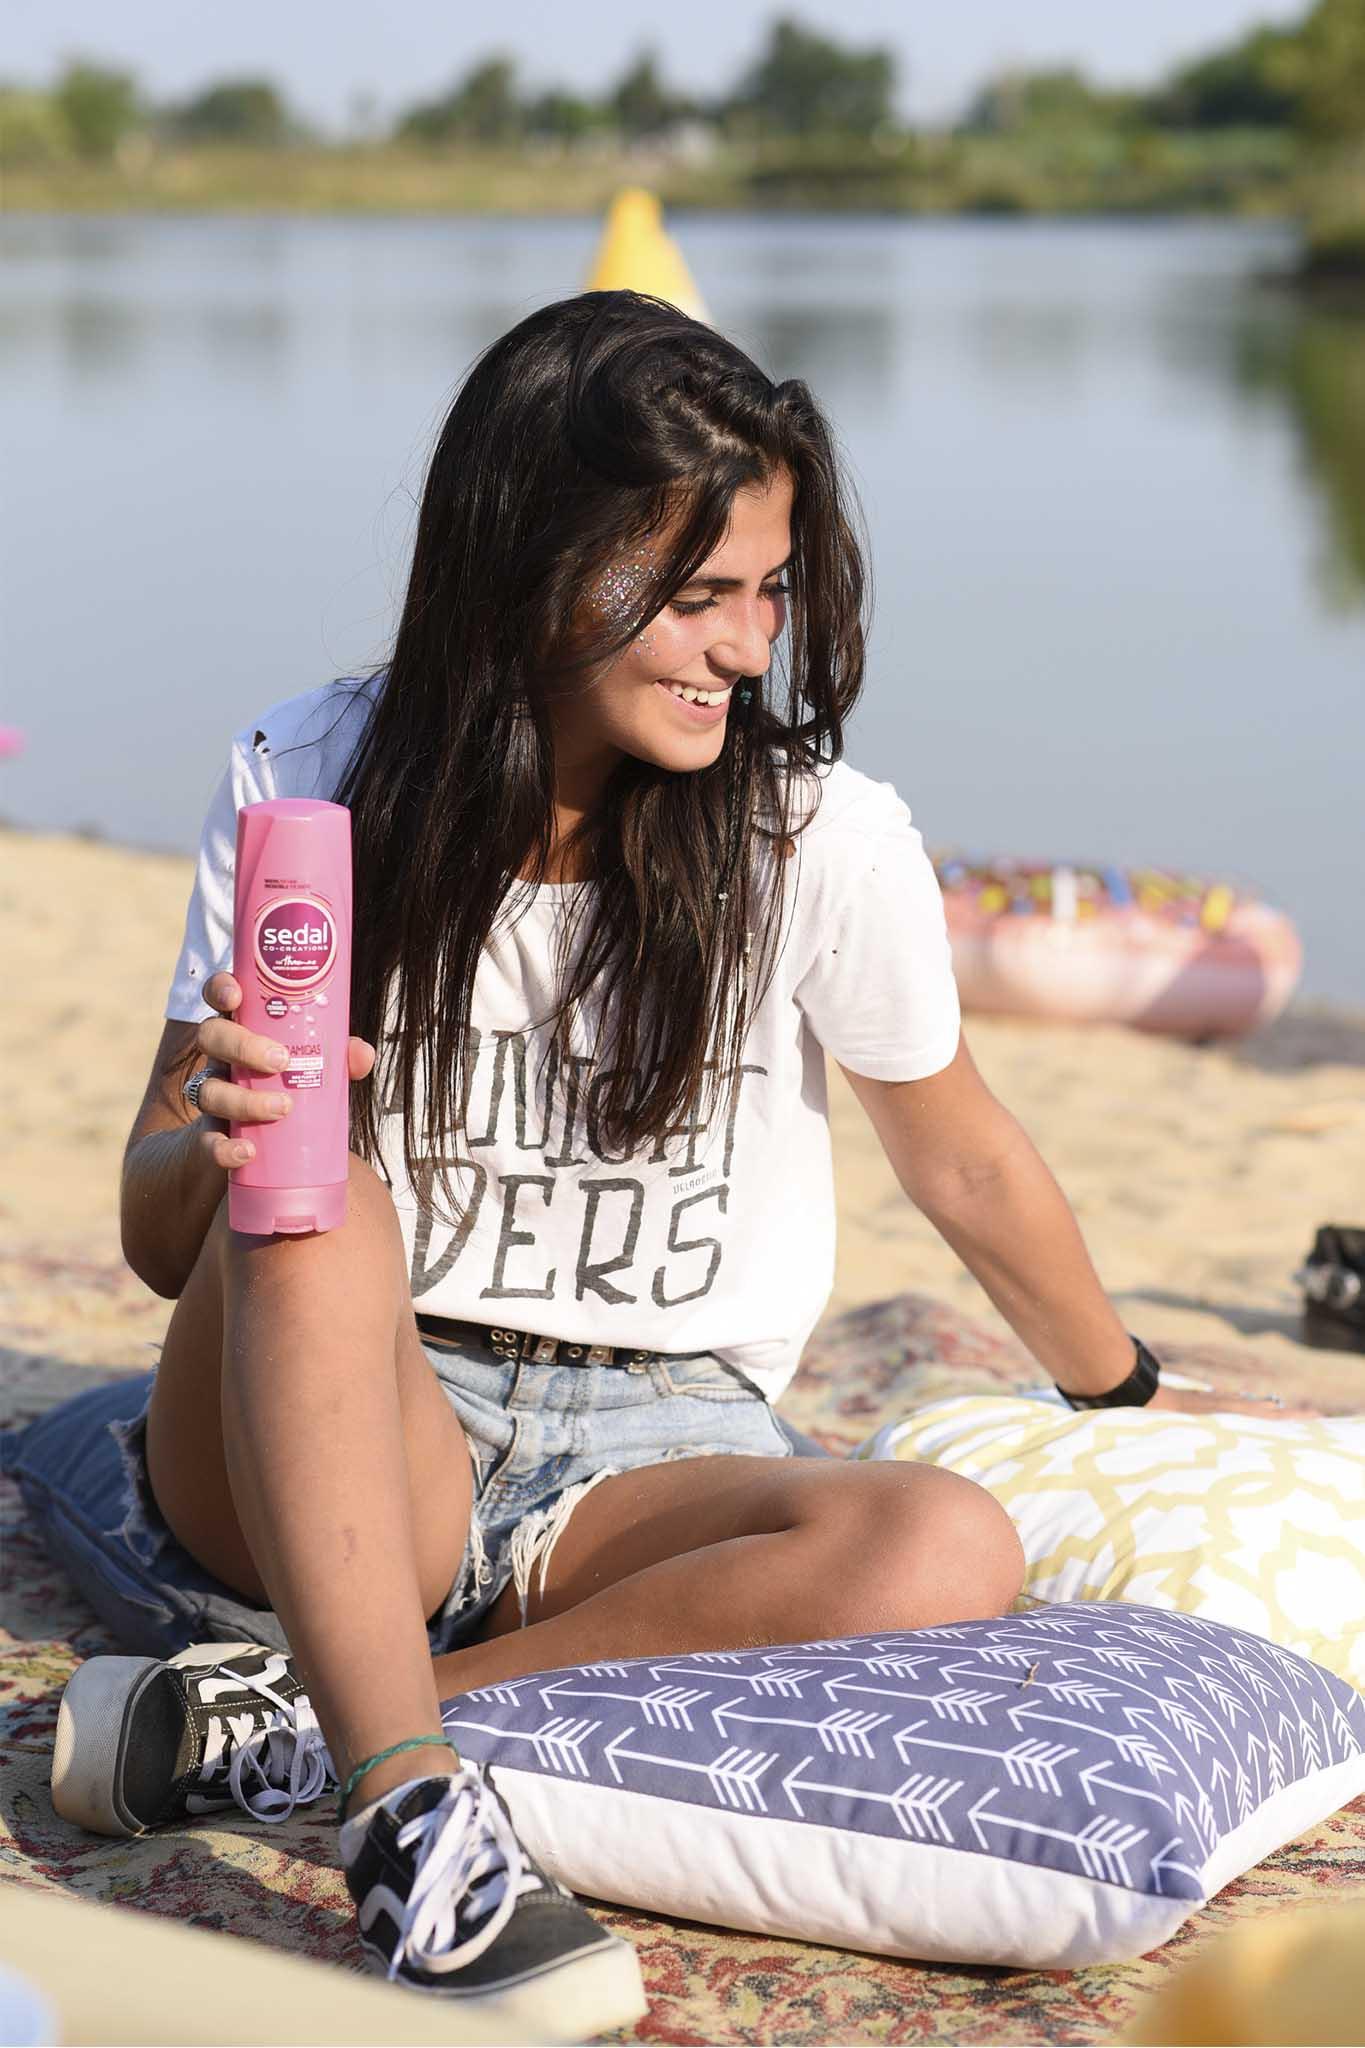 Producto sedal shampoo ceramidas sol moreno verano playa